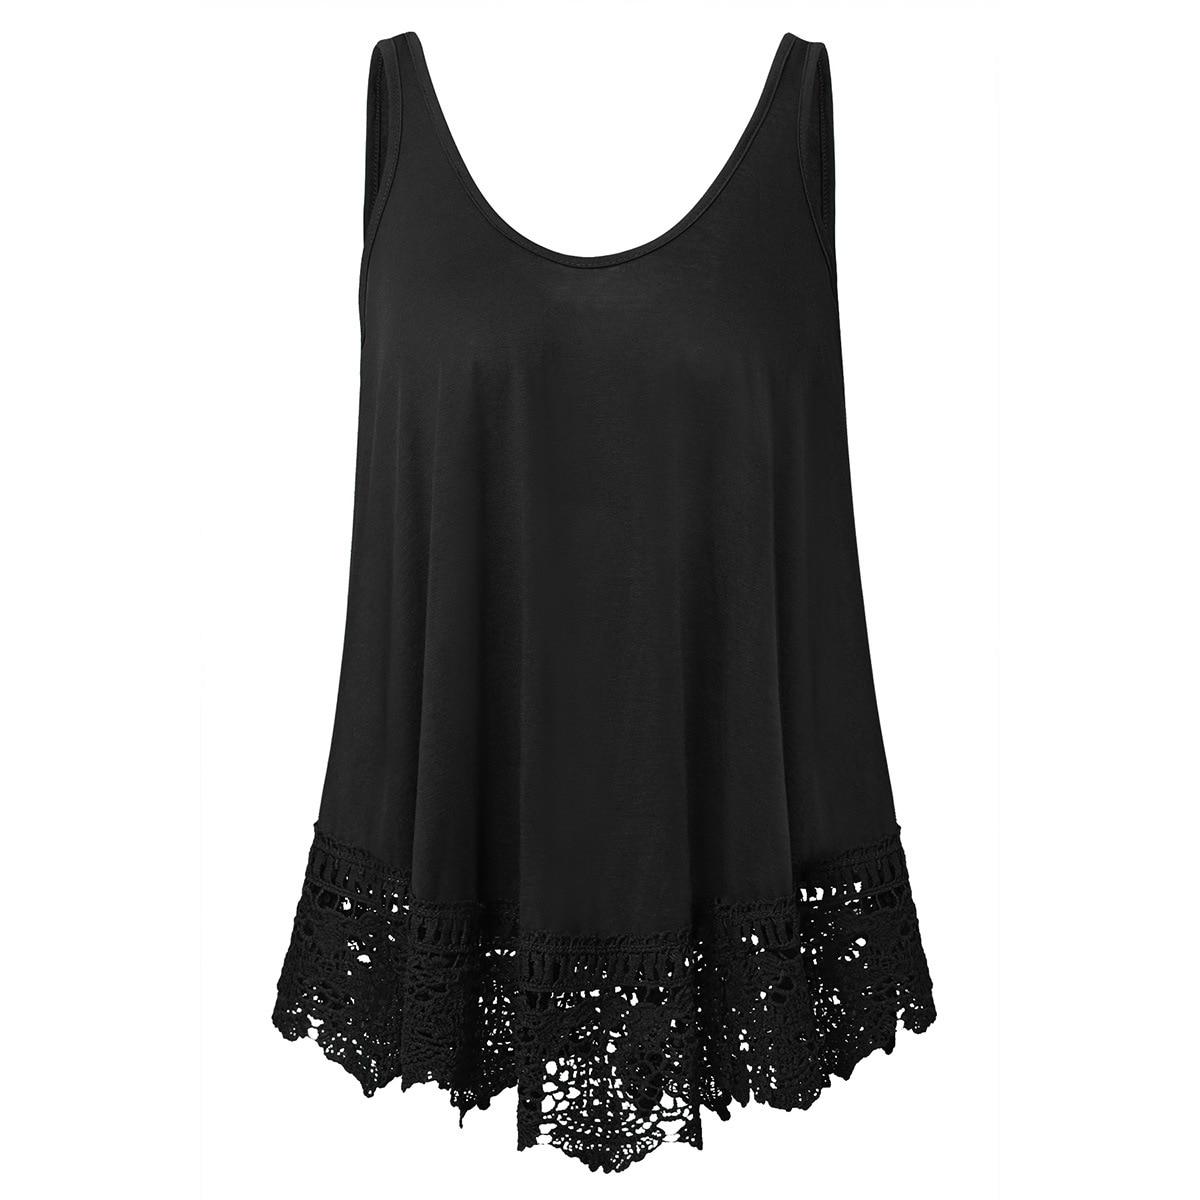 2020 Women Shirt , Lady Top Short Sleeve Garment turquoise